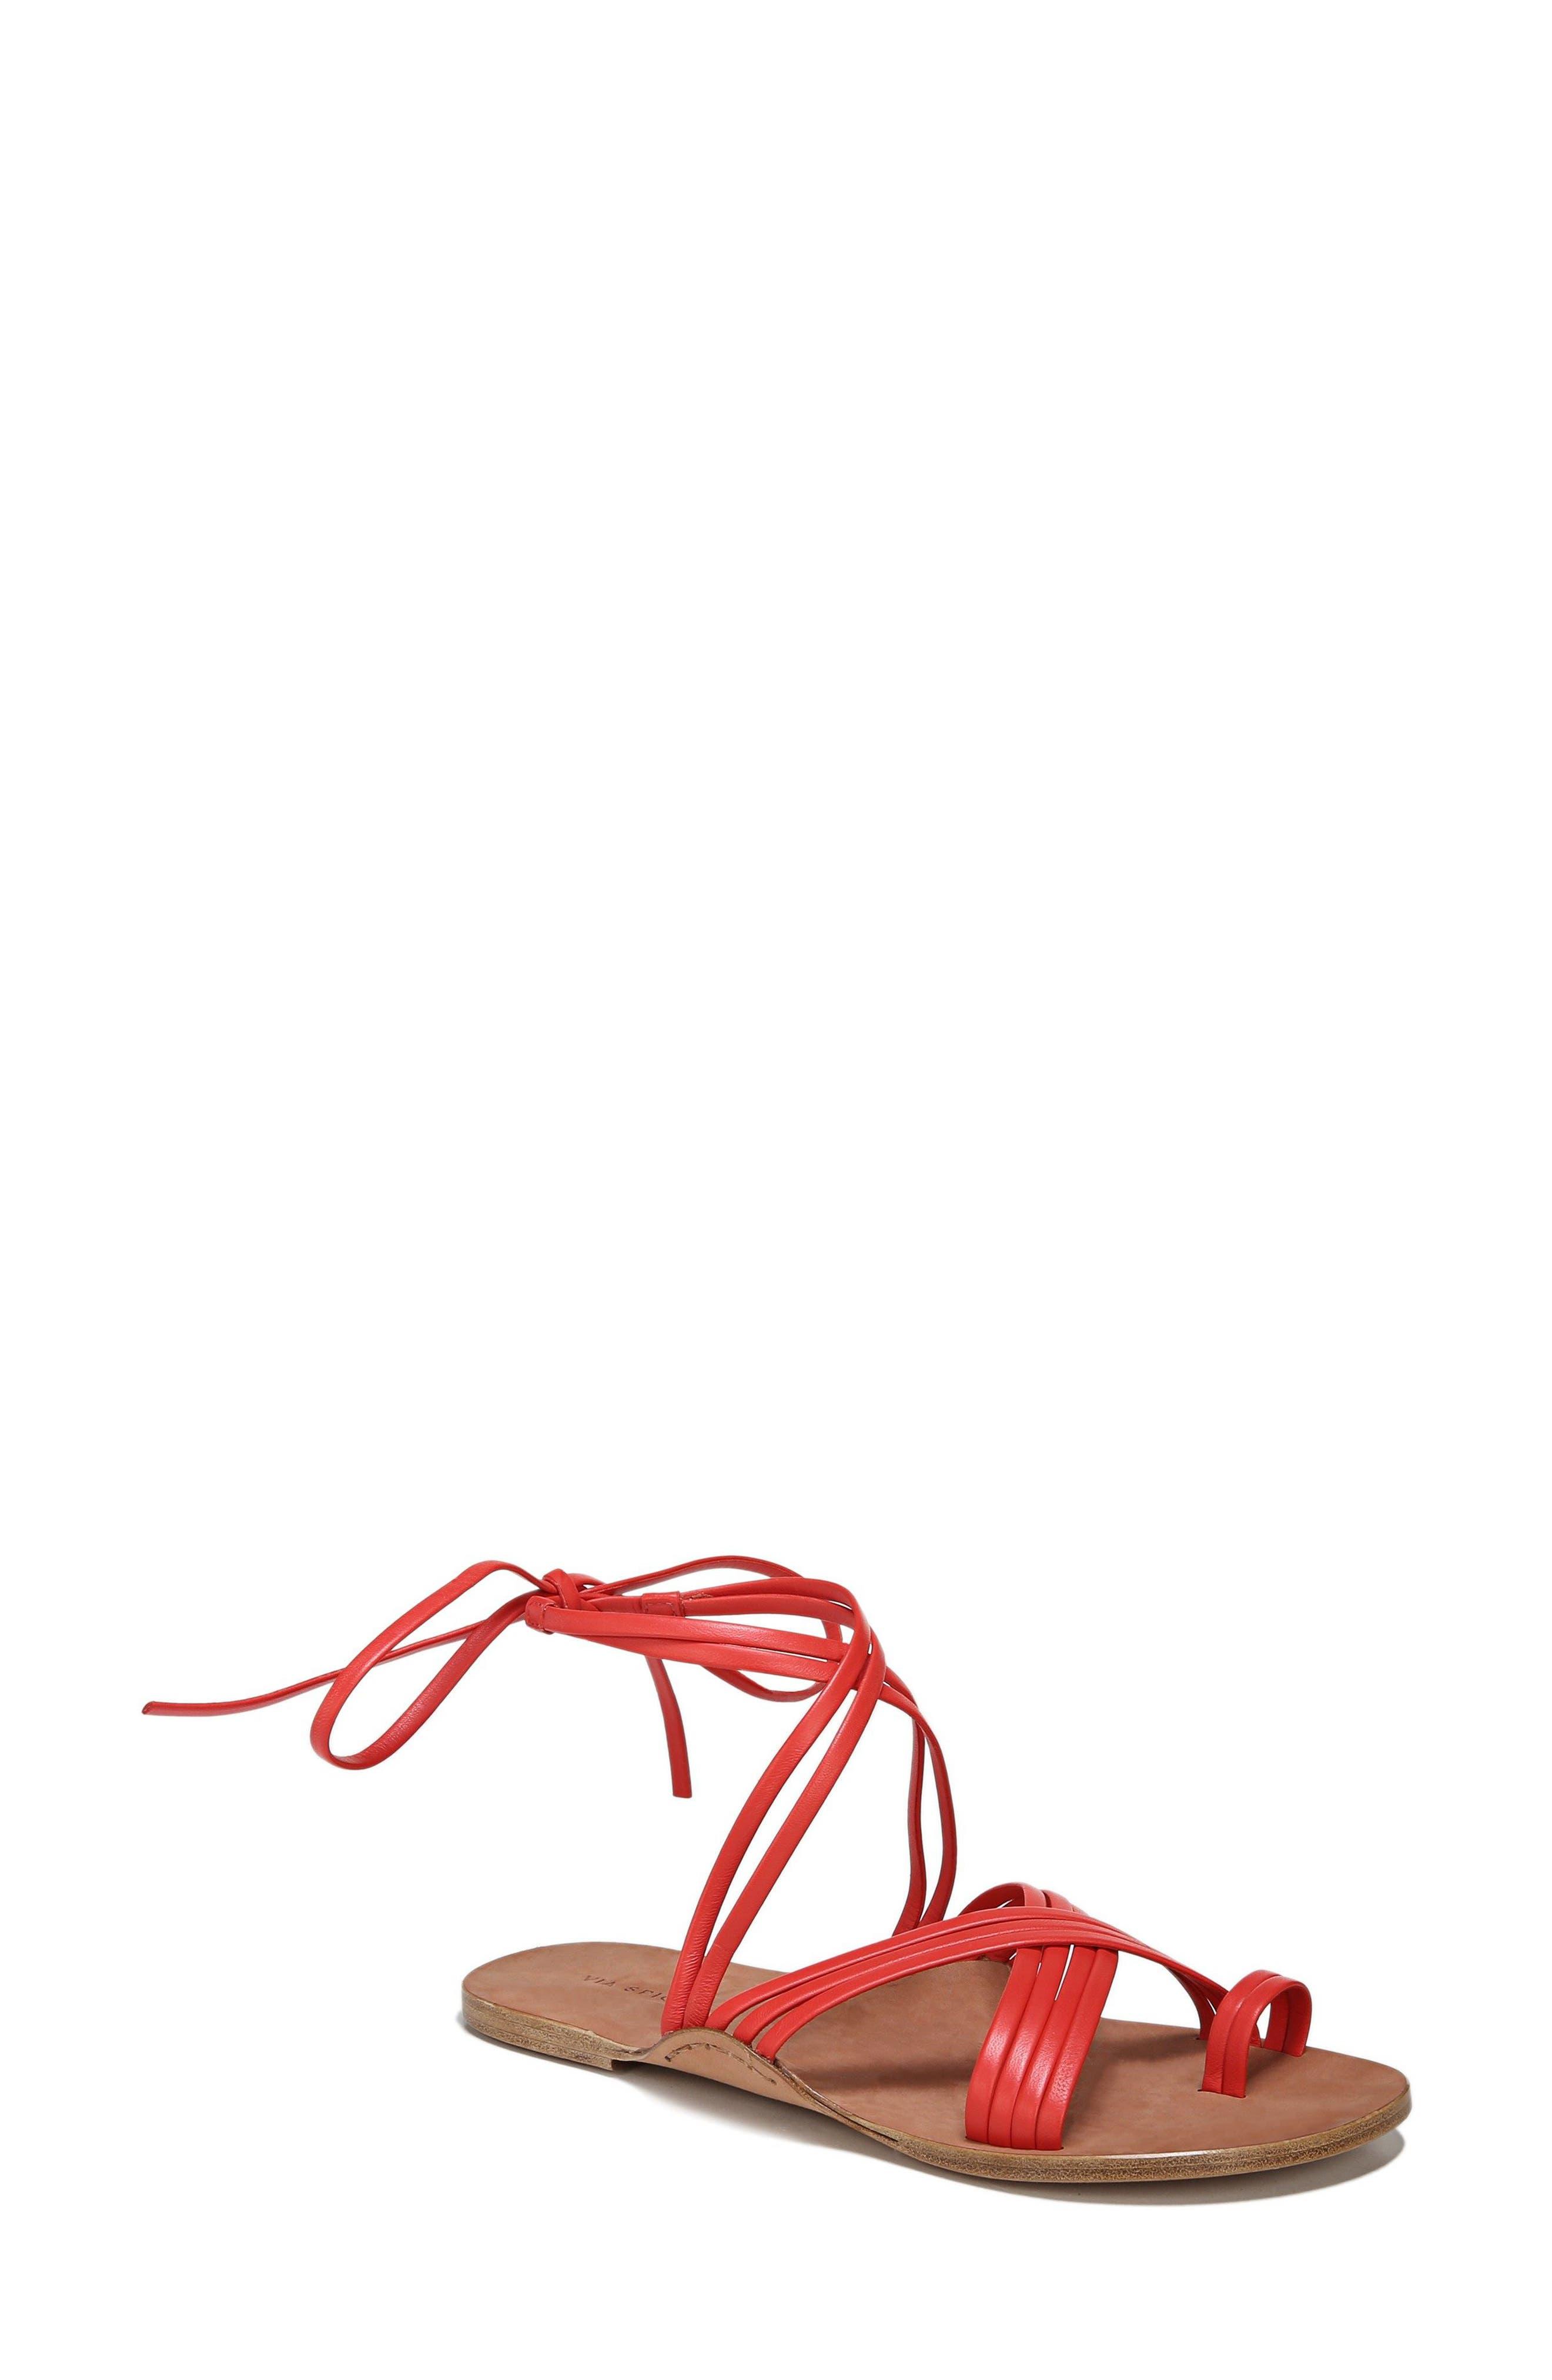 Allegra Sandal,                             Main thumbnail 1, color,                             Poppy Red Leather